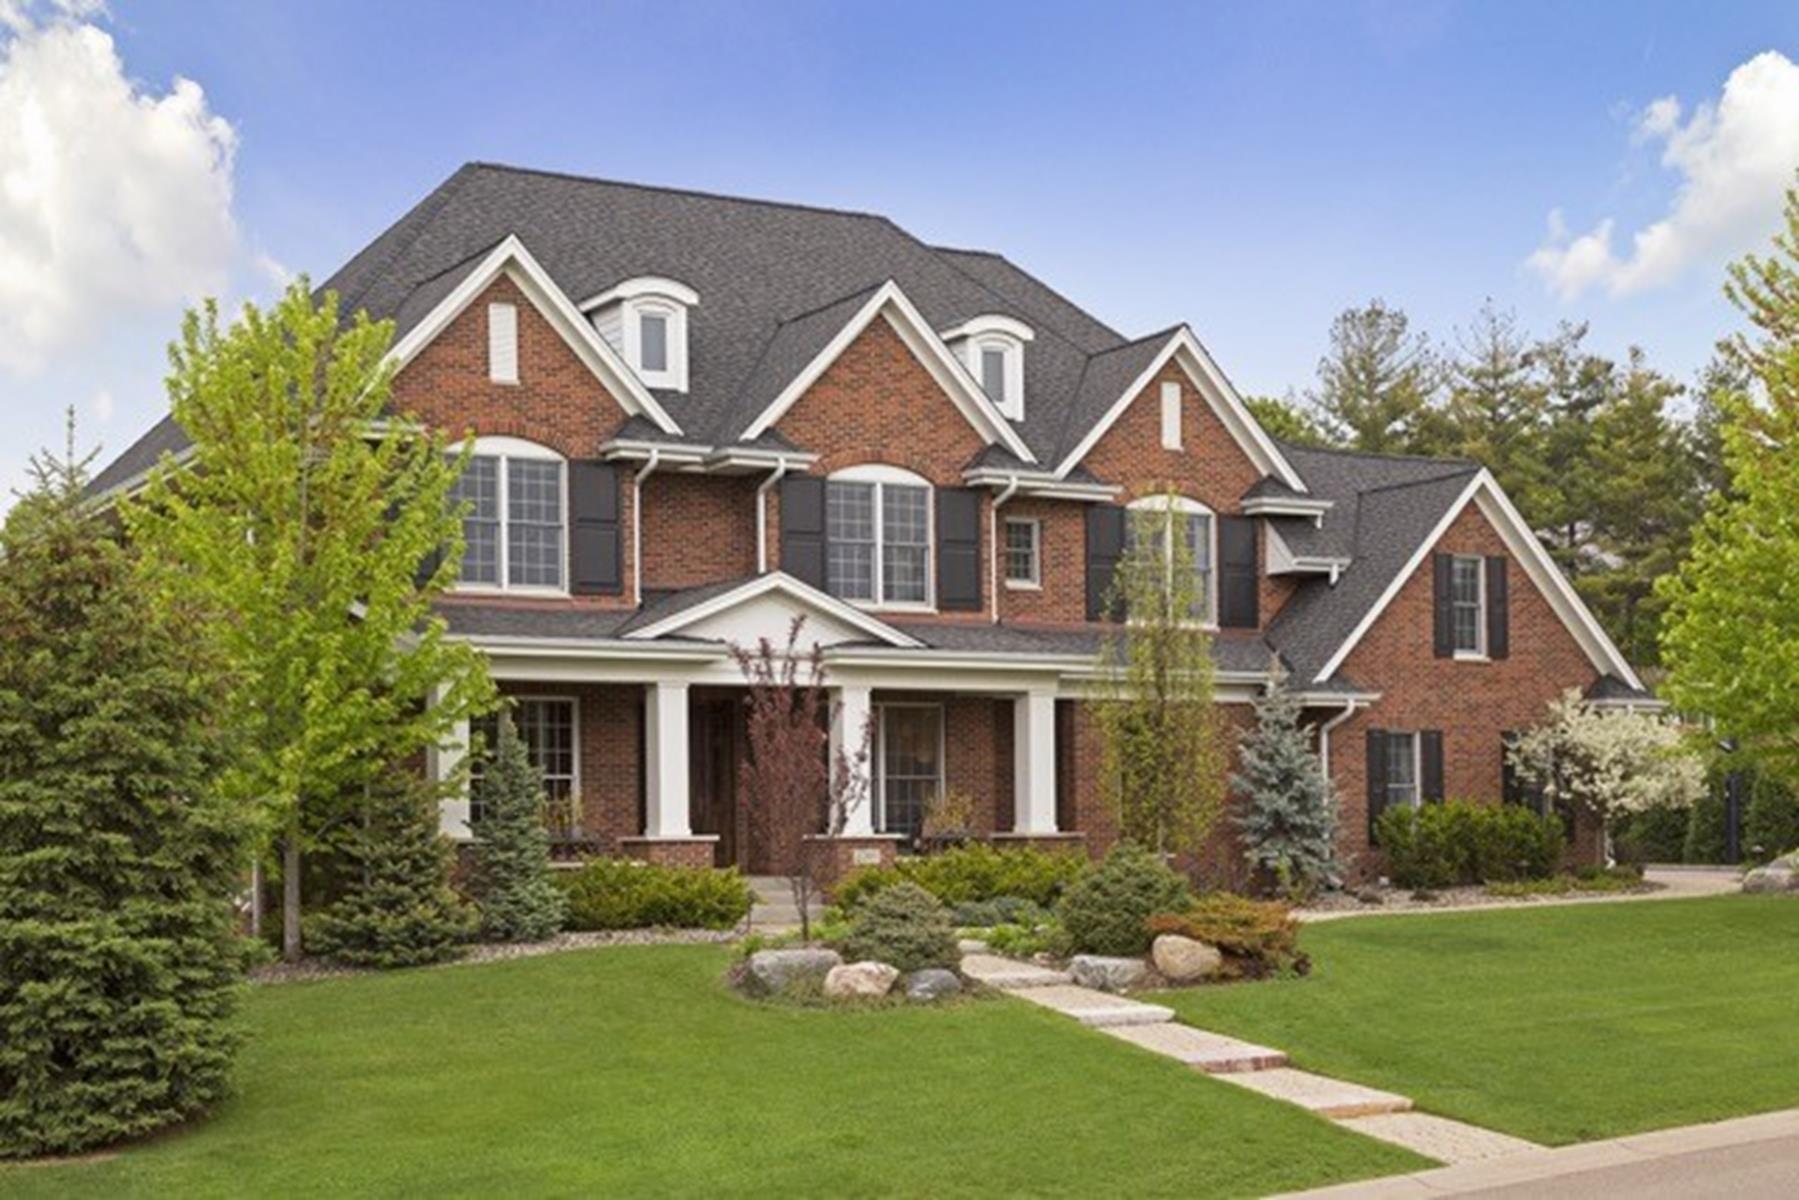 Single Family Home for Sale at 5205 Kelsey Terrace Edina, Minnesota 55436 United States